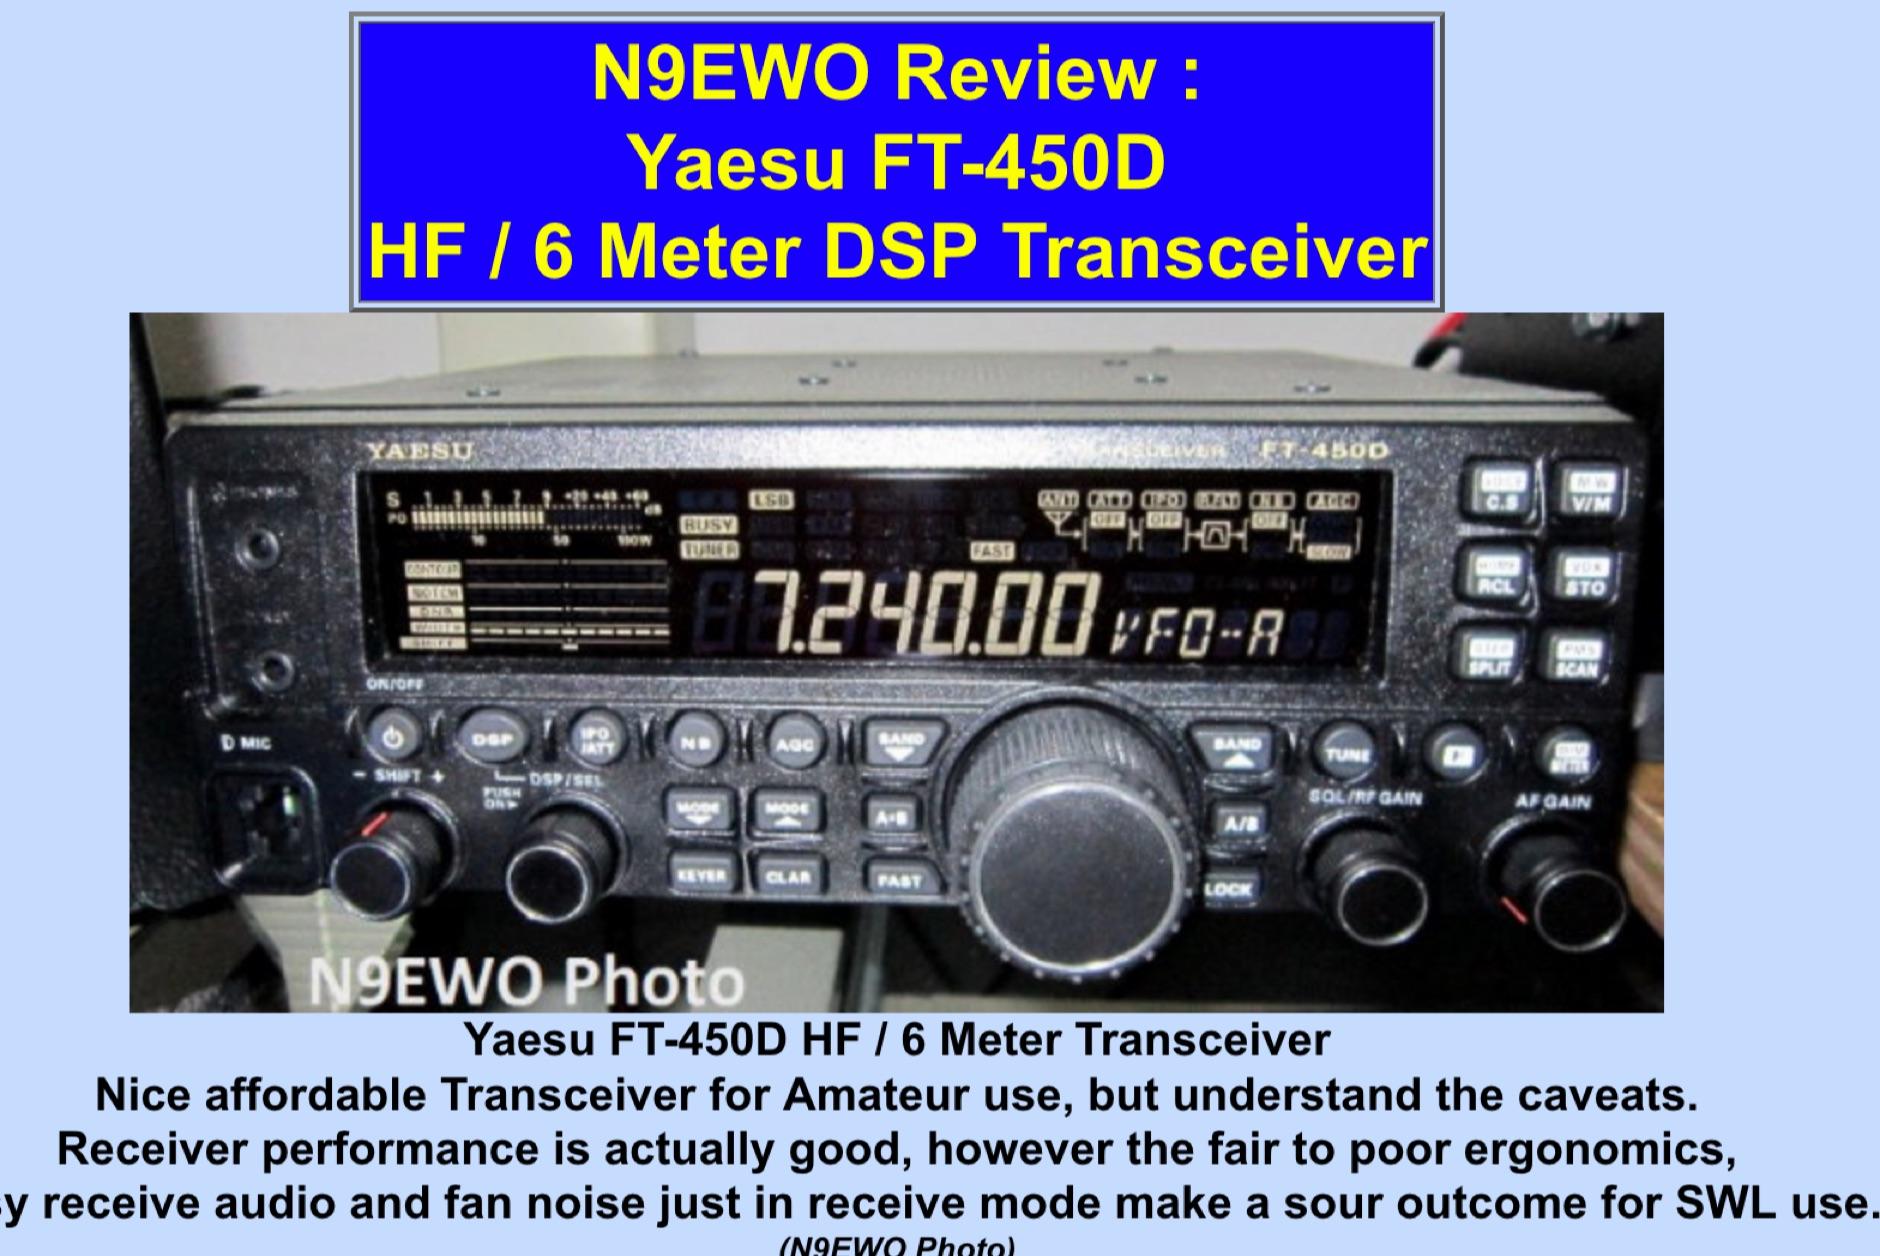 Yaesu FT-450D Review